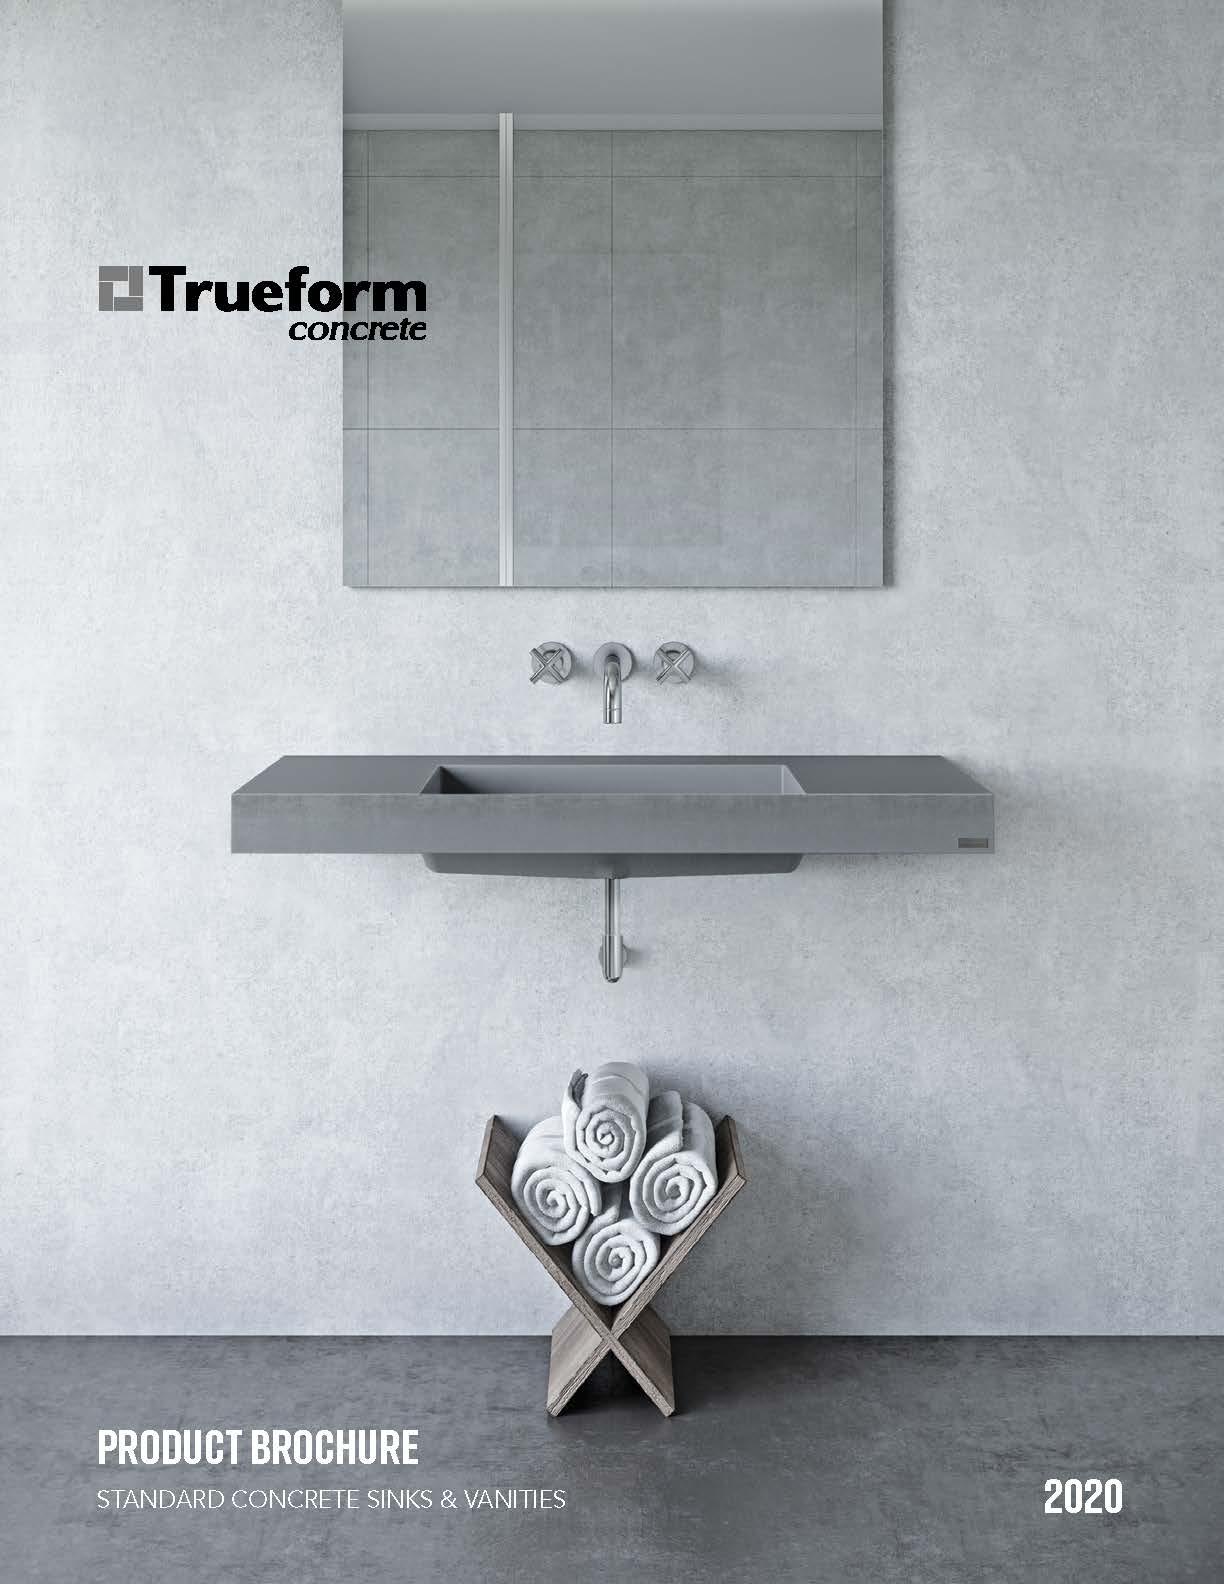 Trueform Concrete Sink Brochure 2020